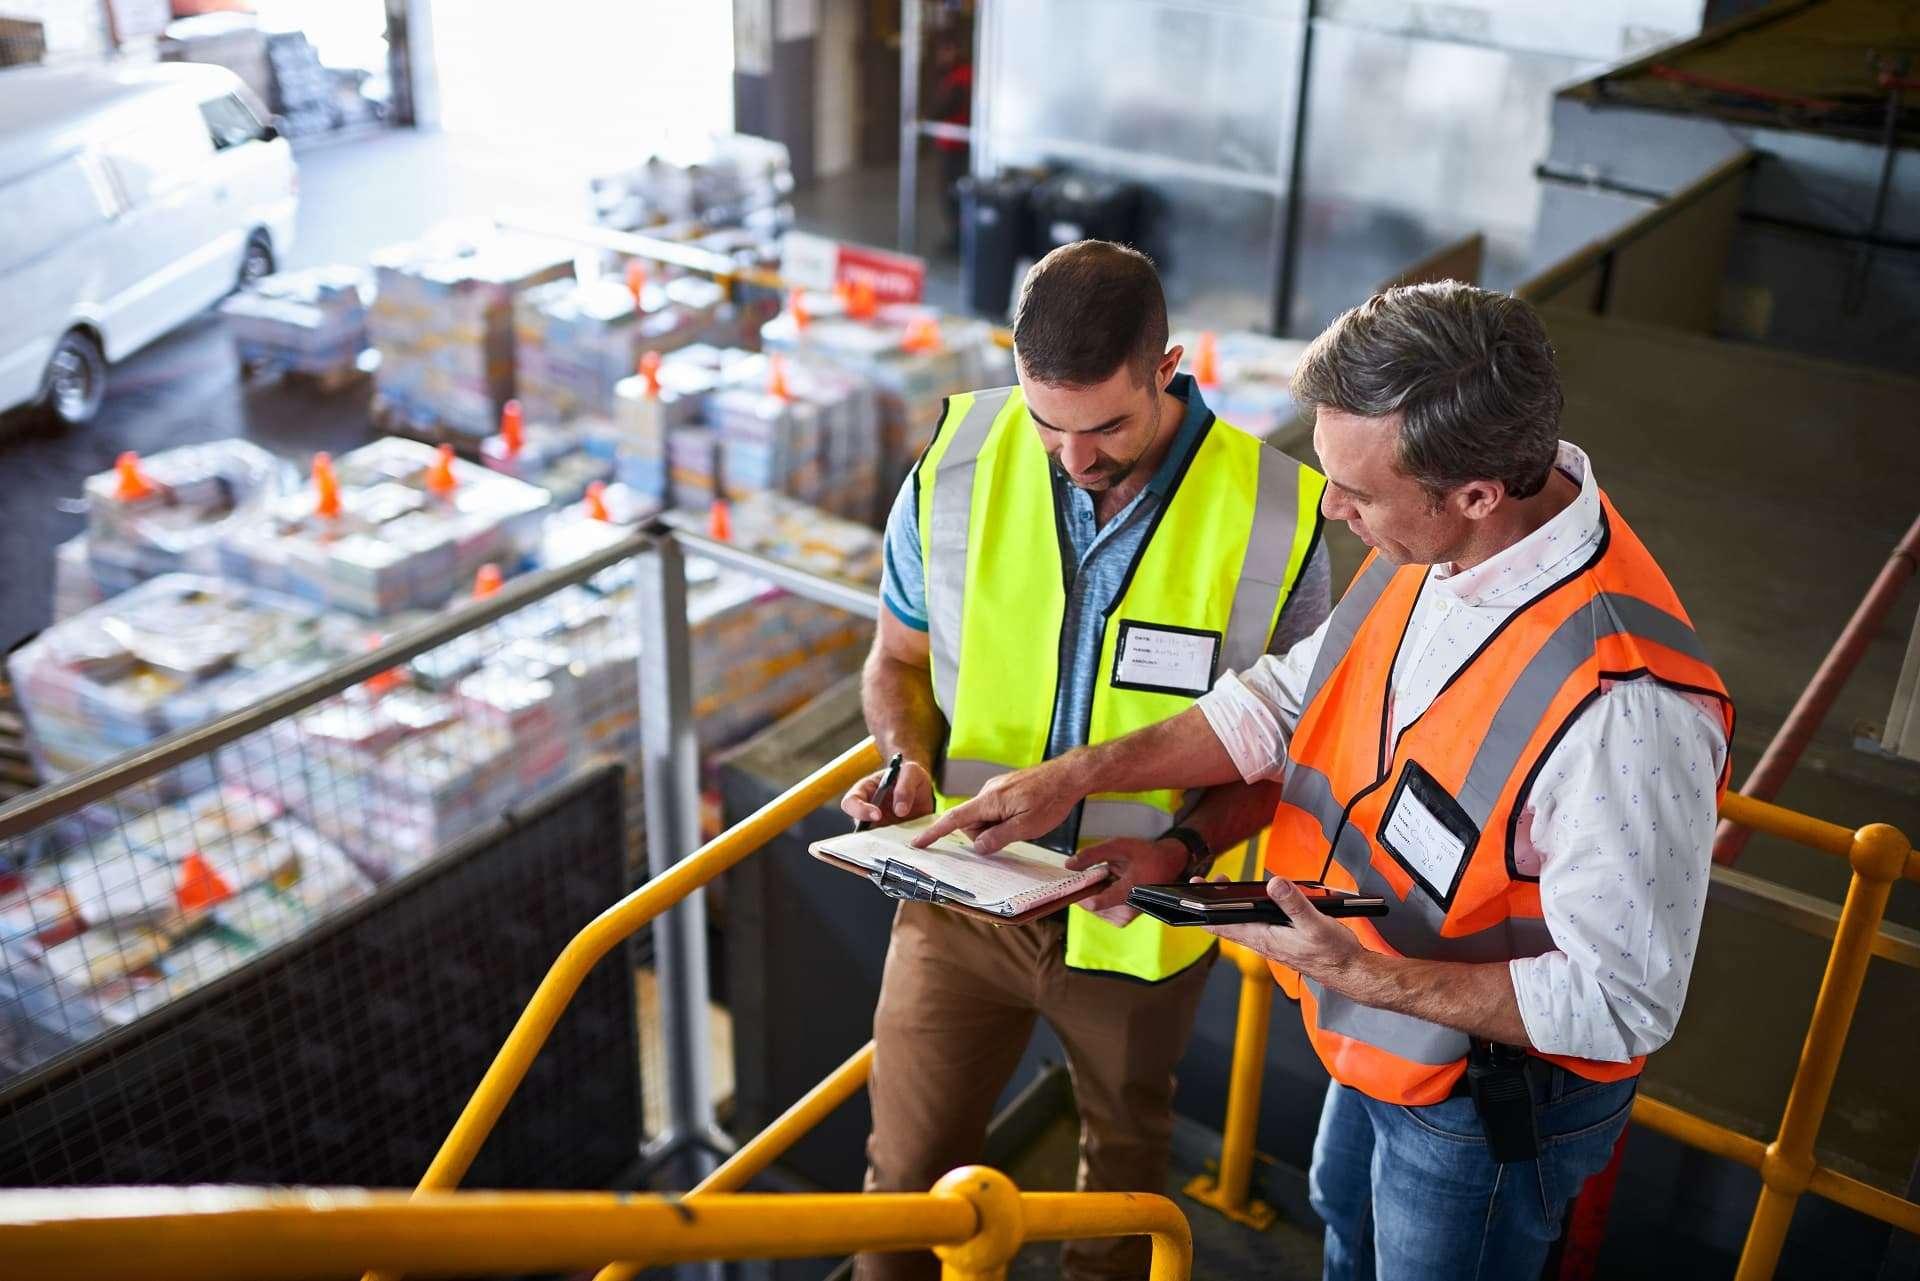 International freight forwarding L3 apprenticeship